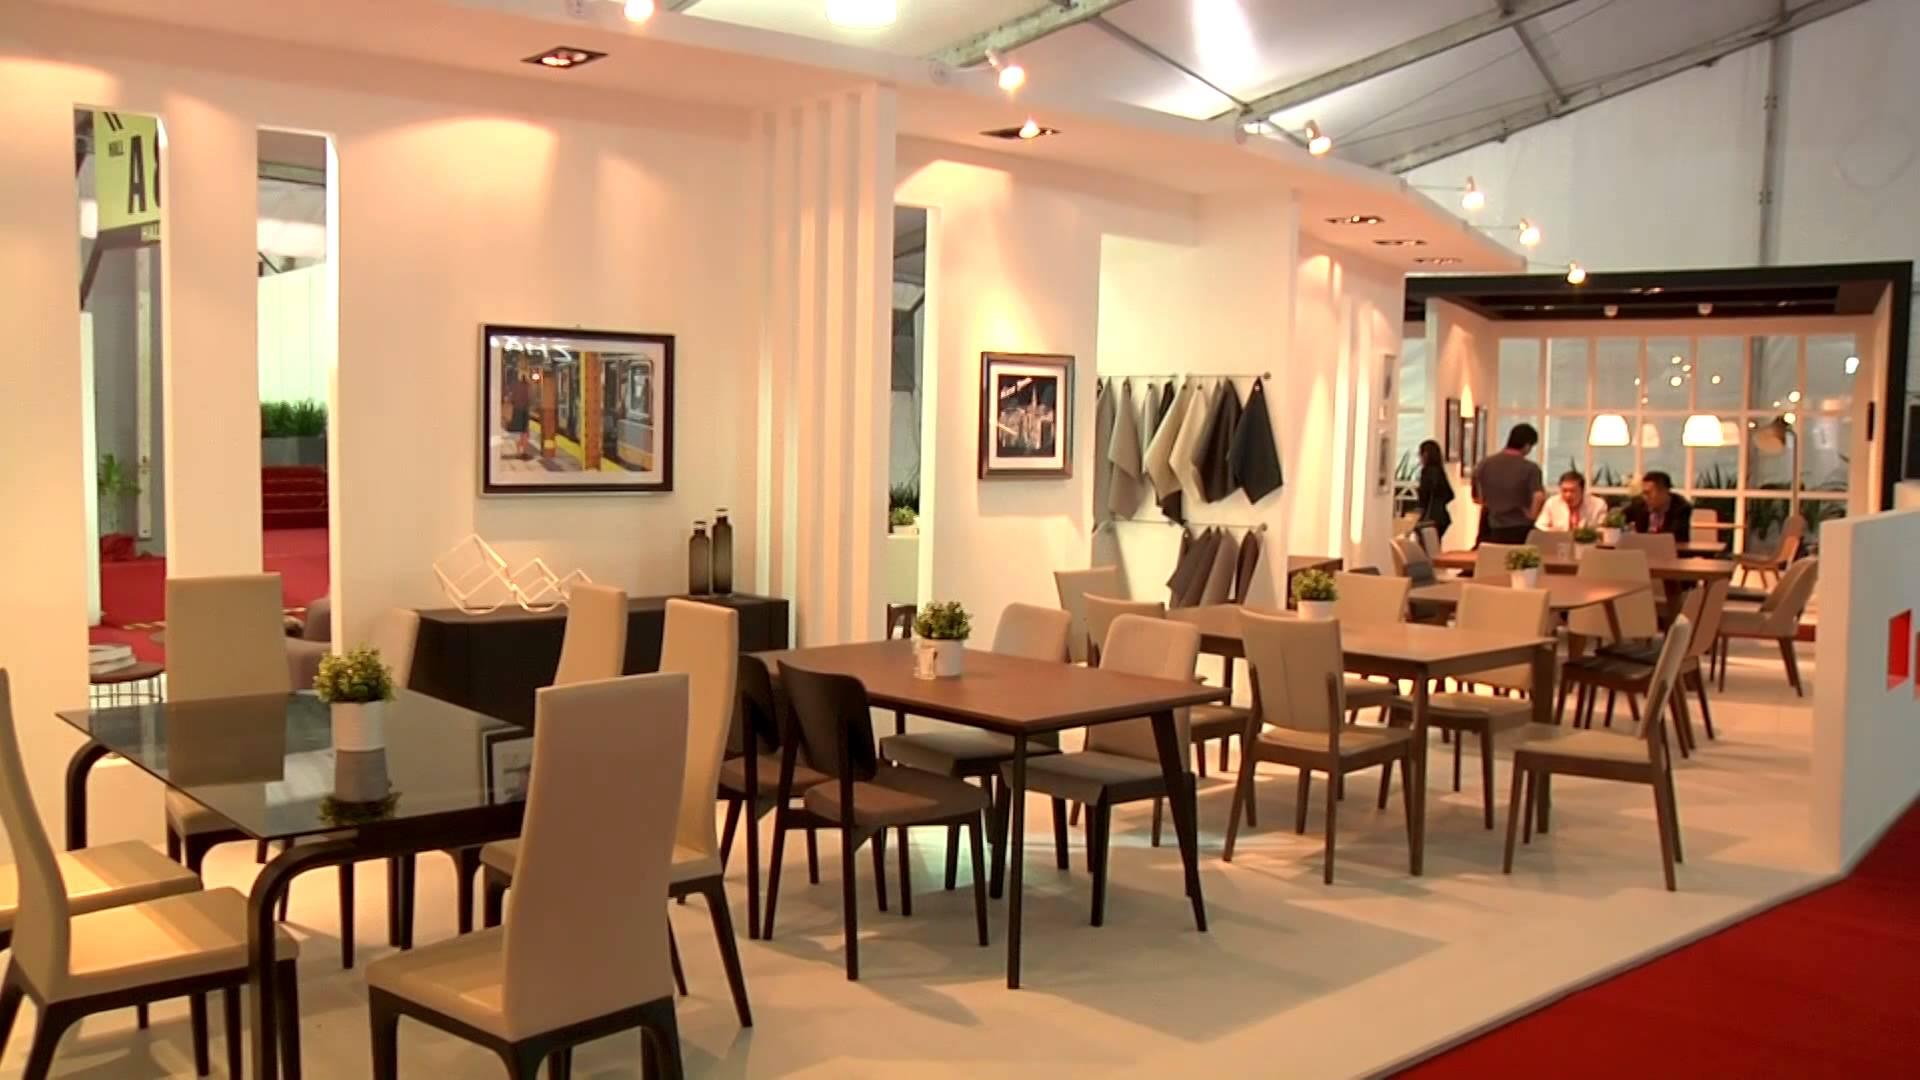 La malesia si affaccia al mondo magazine federmobilimagazine federmobili Vastu home furniture jakarta